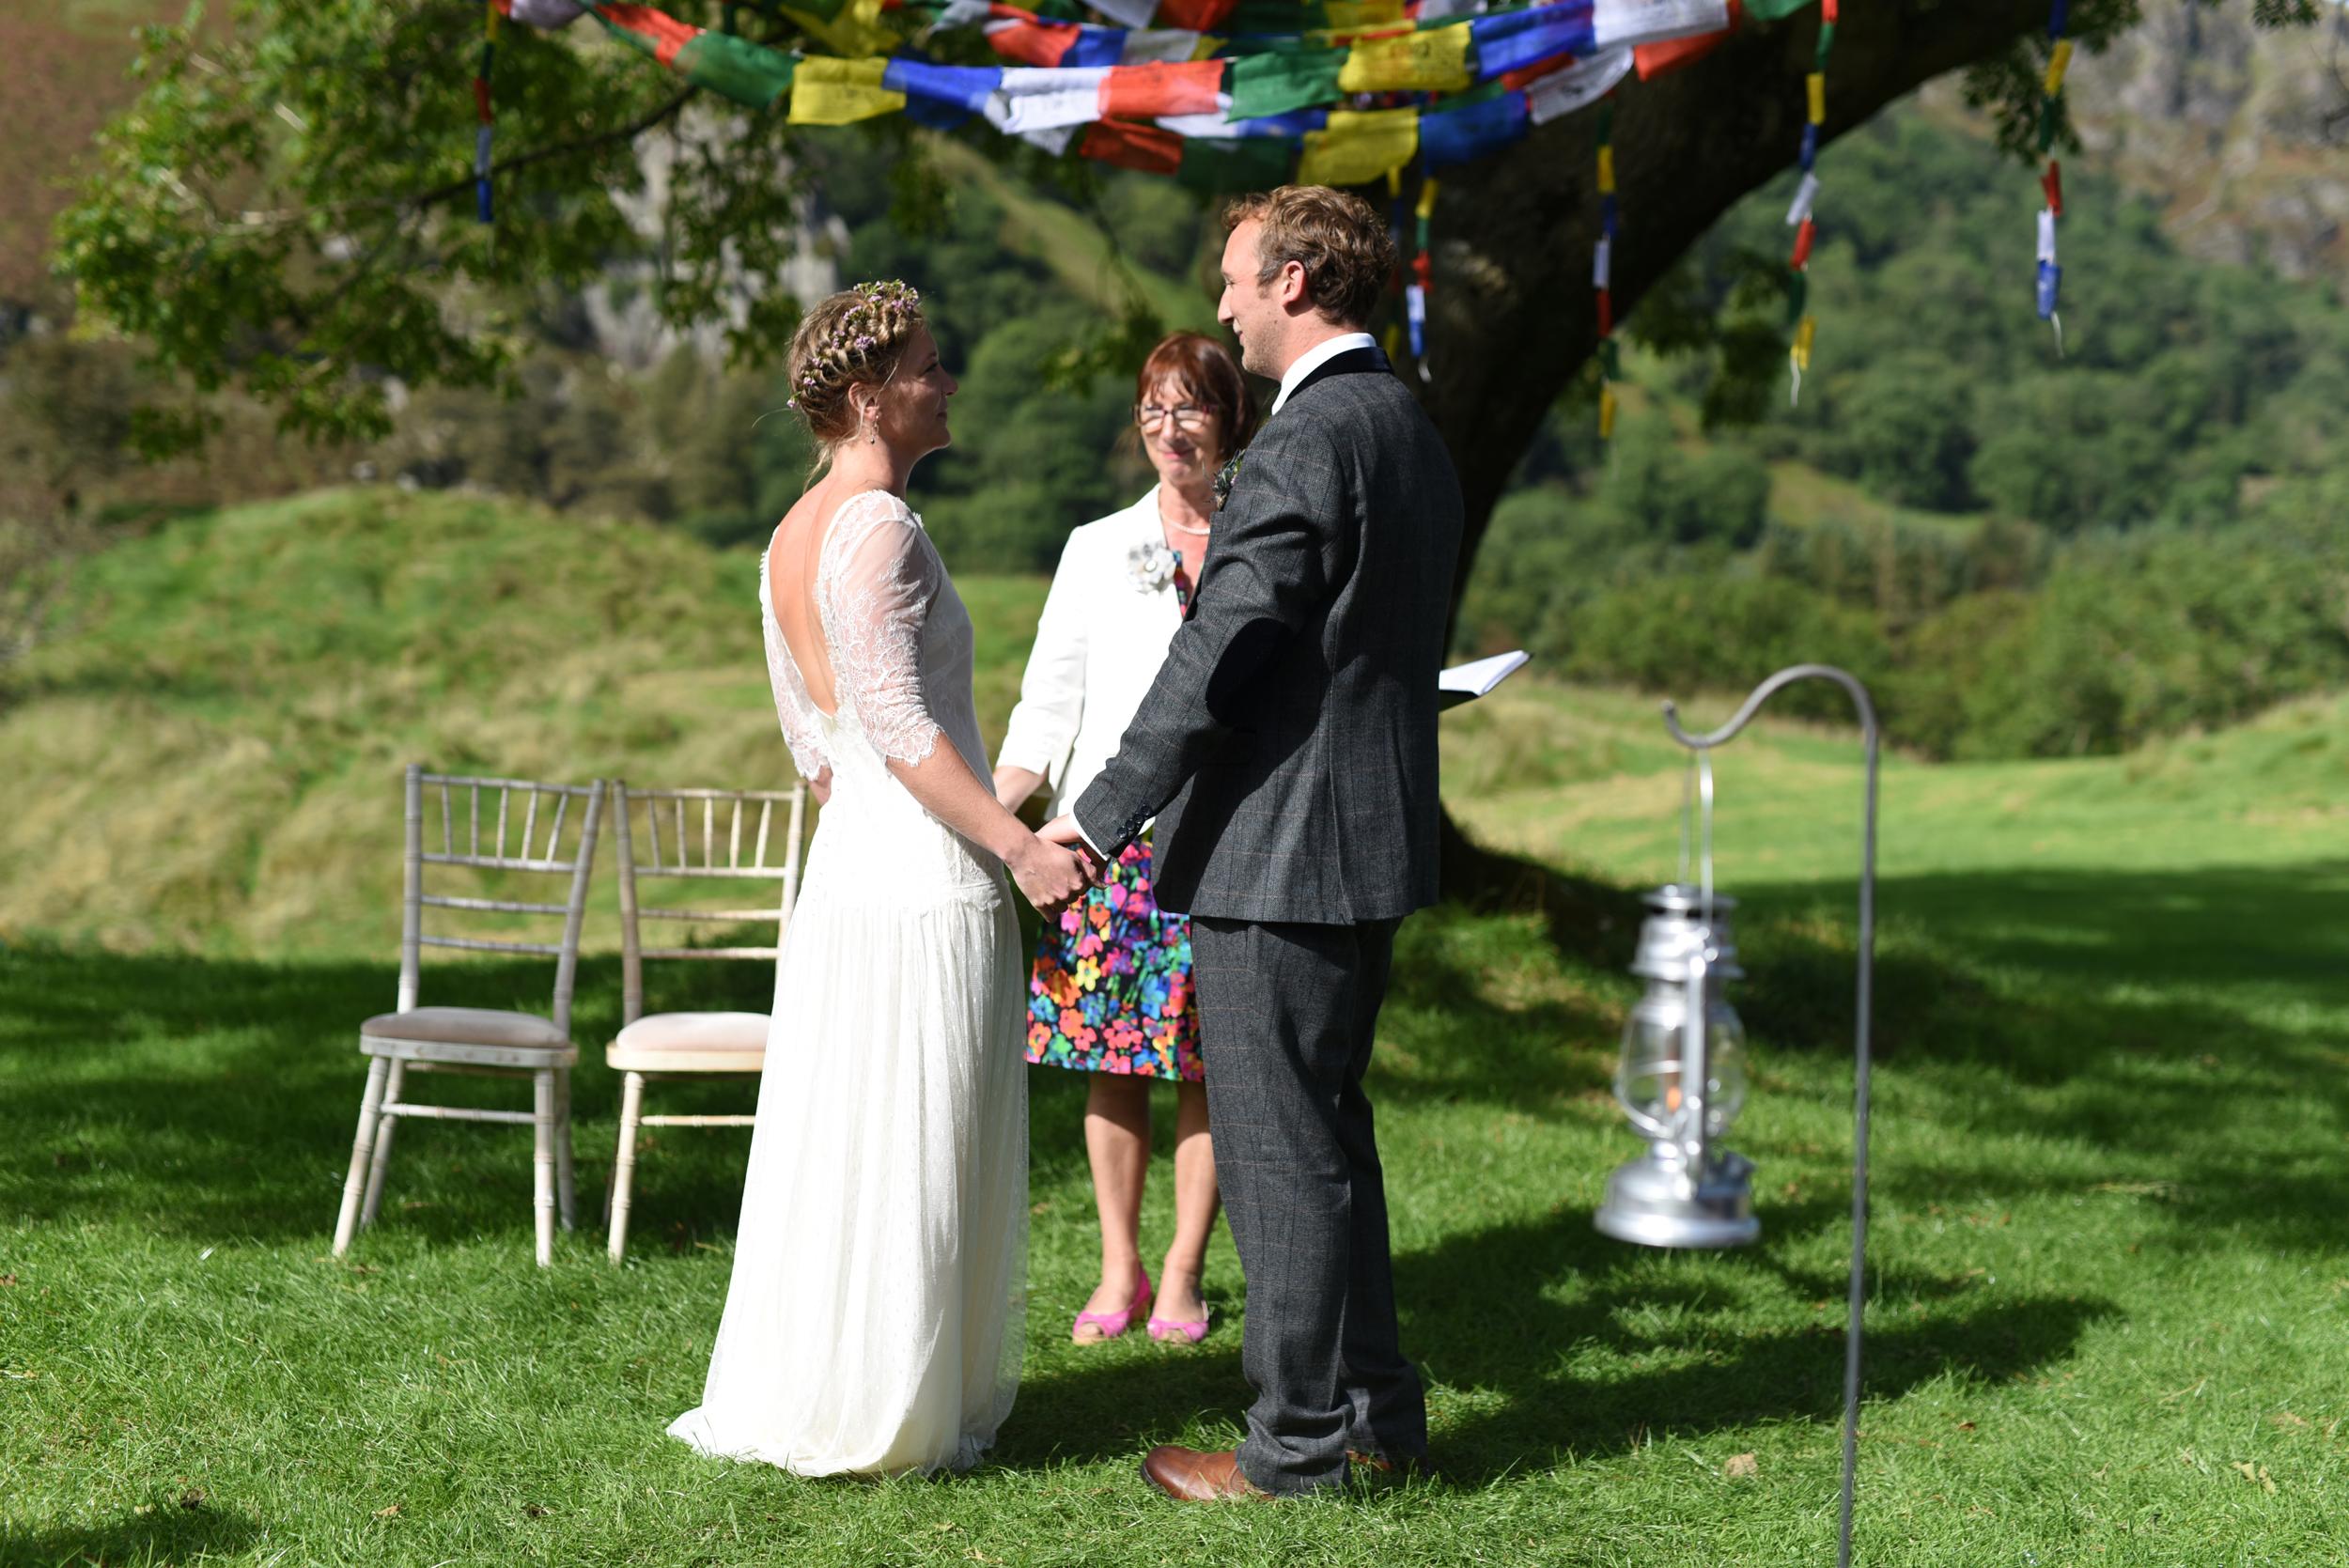 Miriam-Bespoke-Lace-Wedding-Dress-Kate-Beaumont-Sheffield-2.jpg